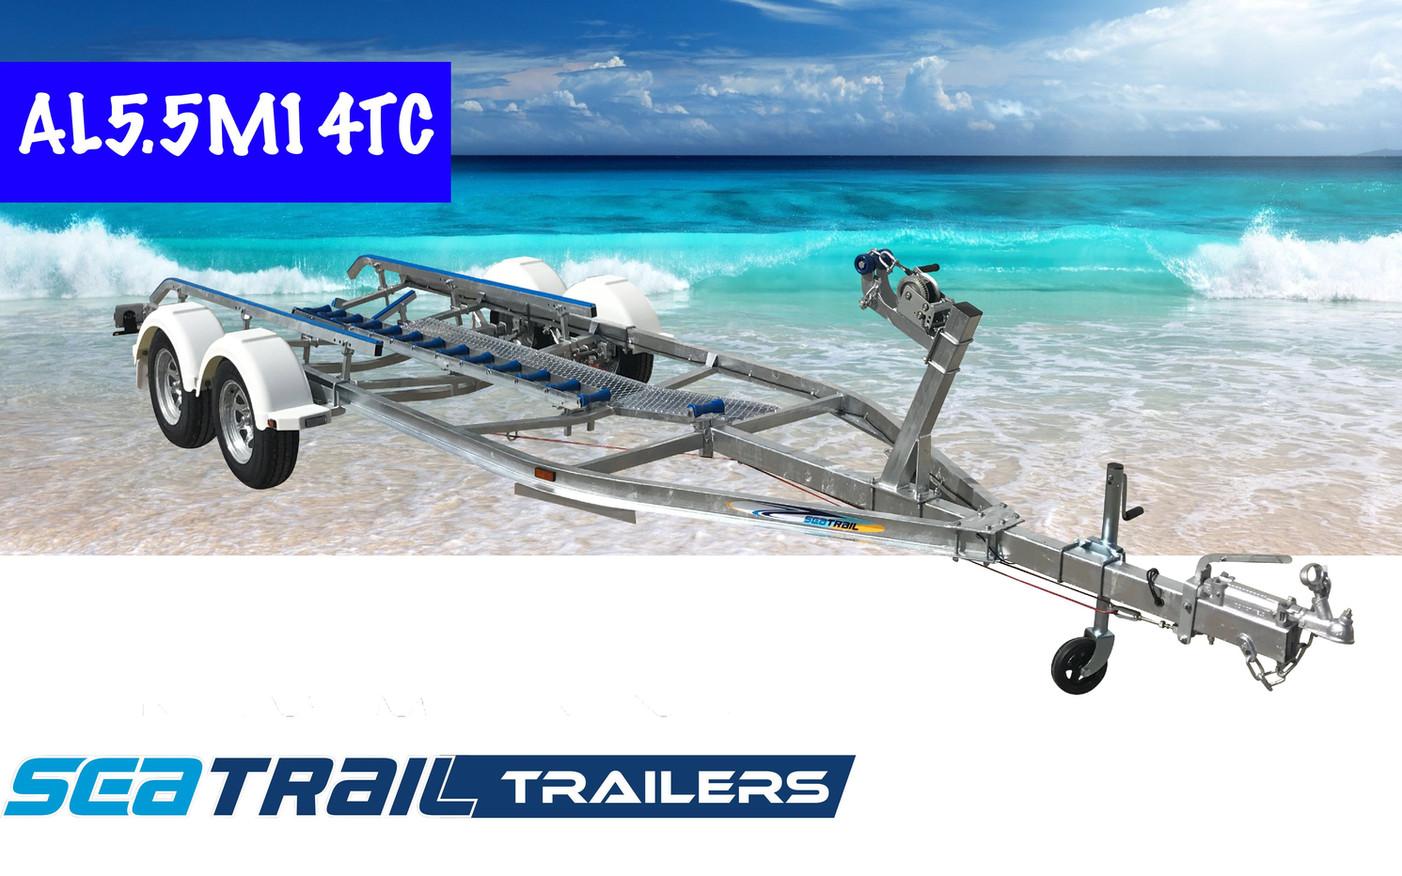 SEATRAIL AL5.5M14TC C-CHANNEL TANDEM SKID BOAT TRAILER